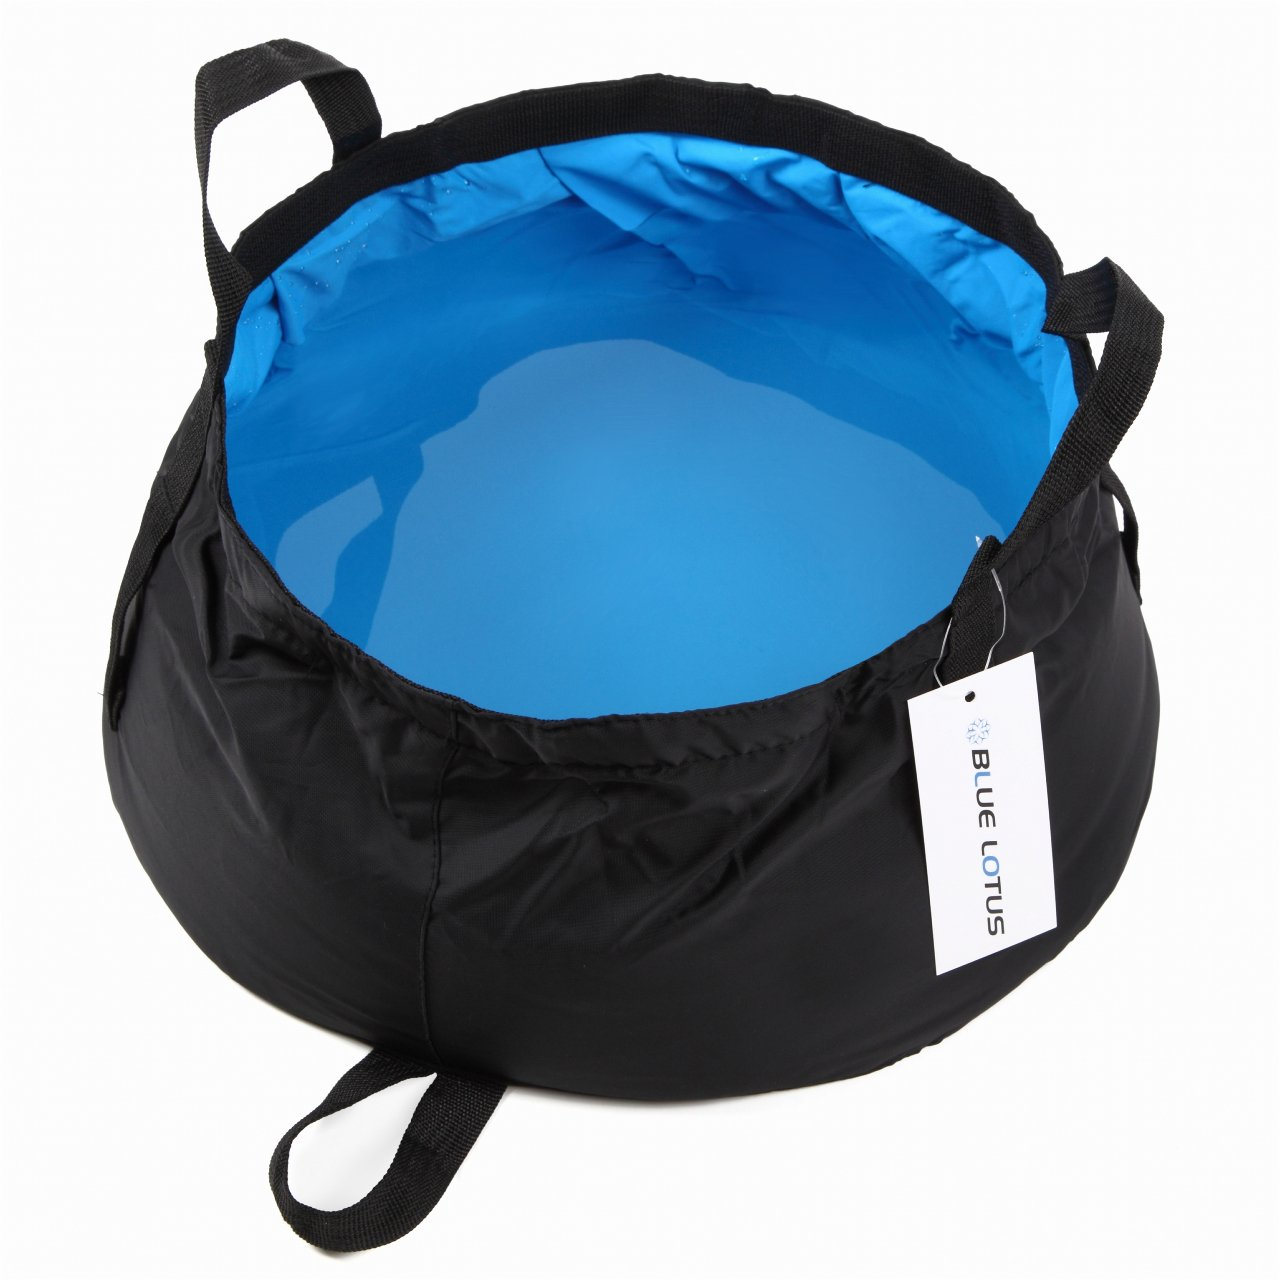 BLUELOTUS Ultralight Portable Foldable Bucket 12L